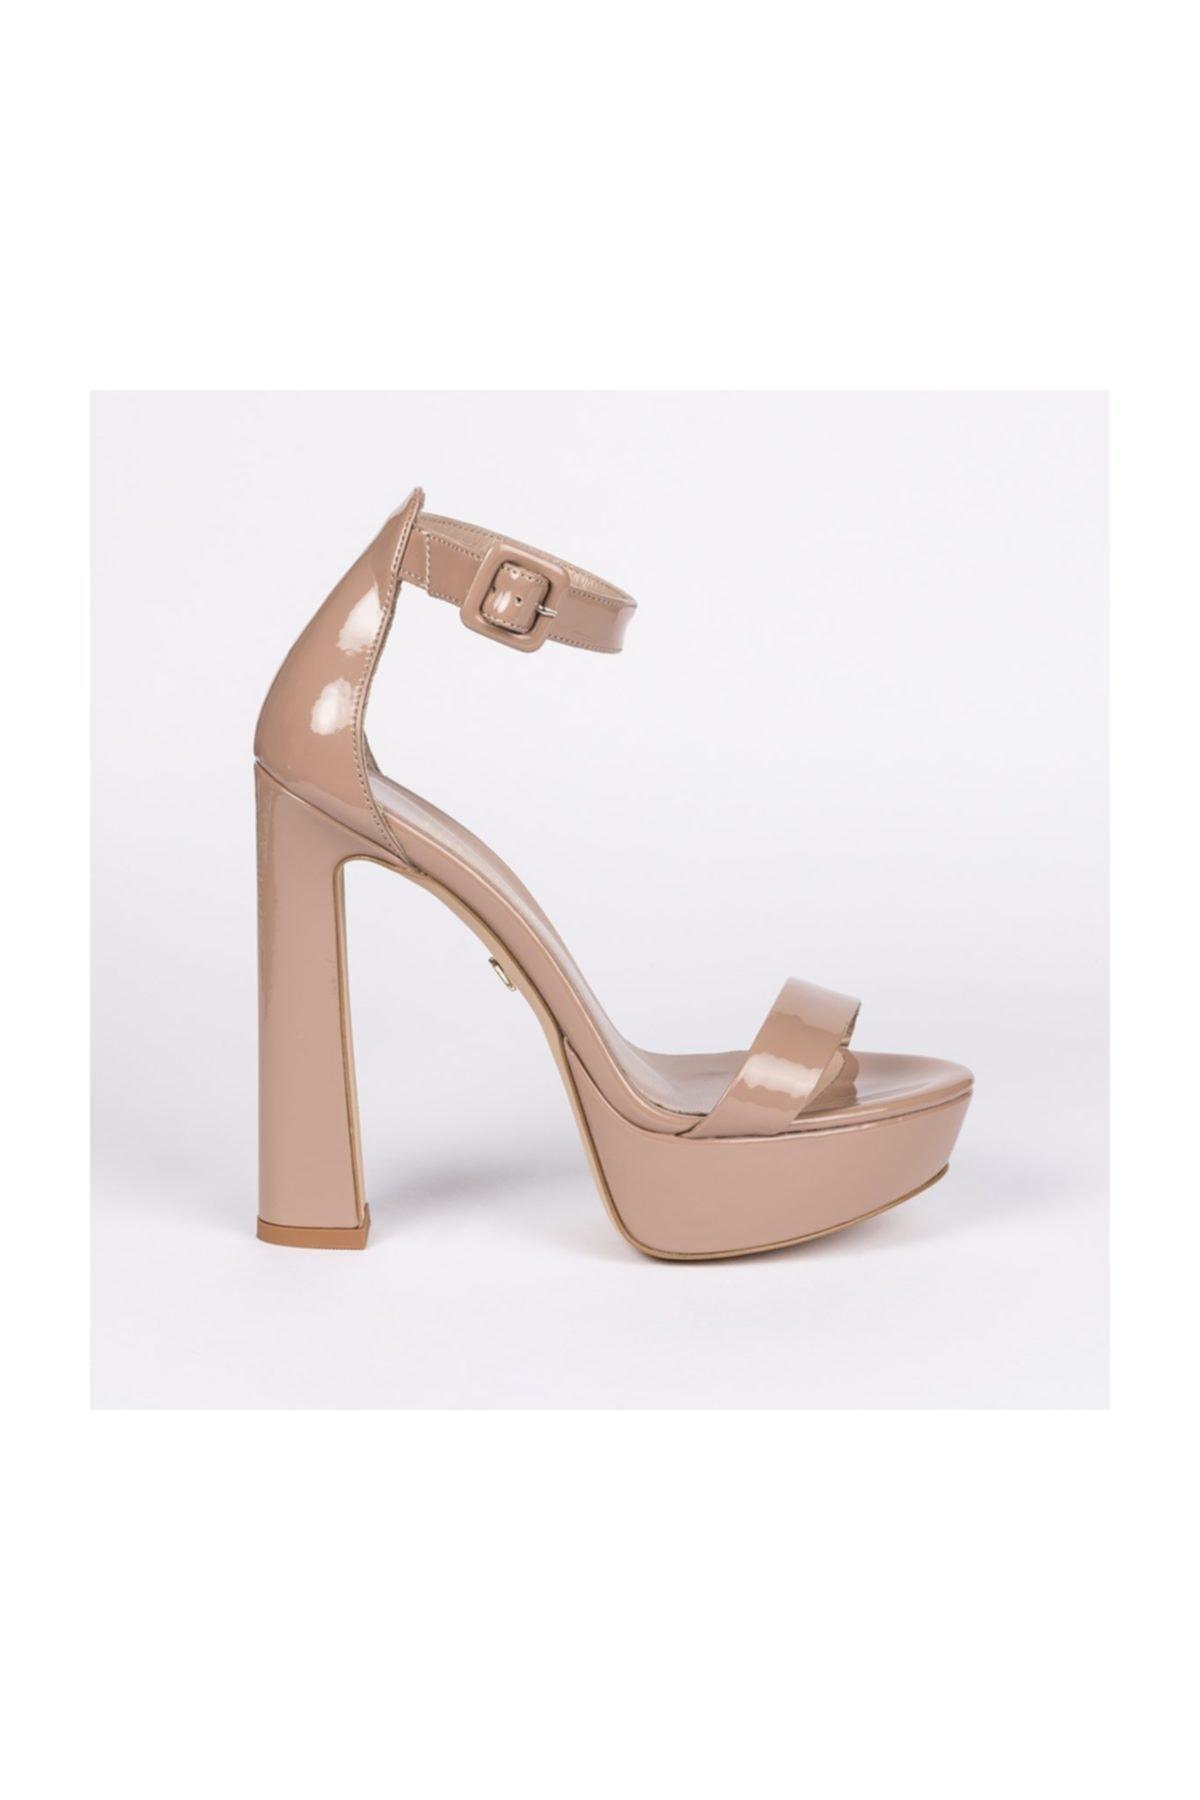 Jabotter Desire Karamel Rugan Platform Topuklu Ayakkabı 1